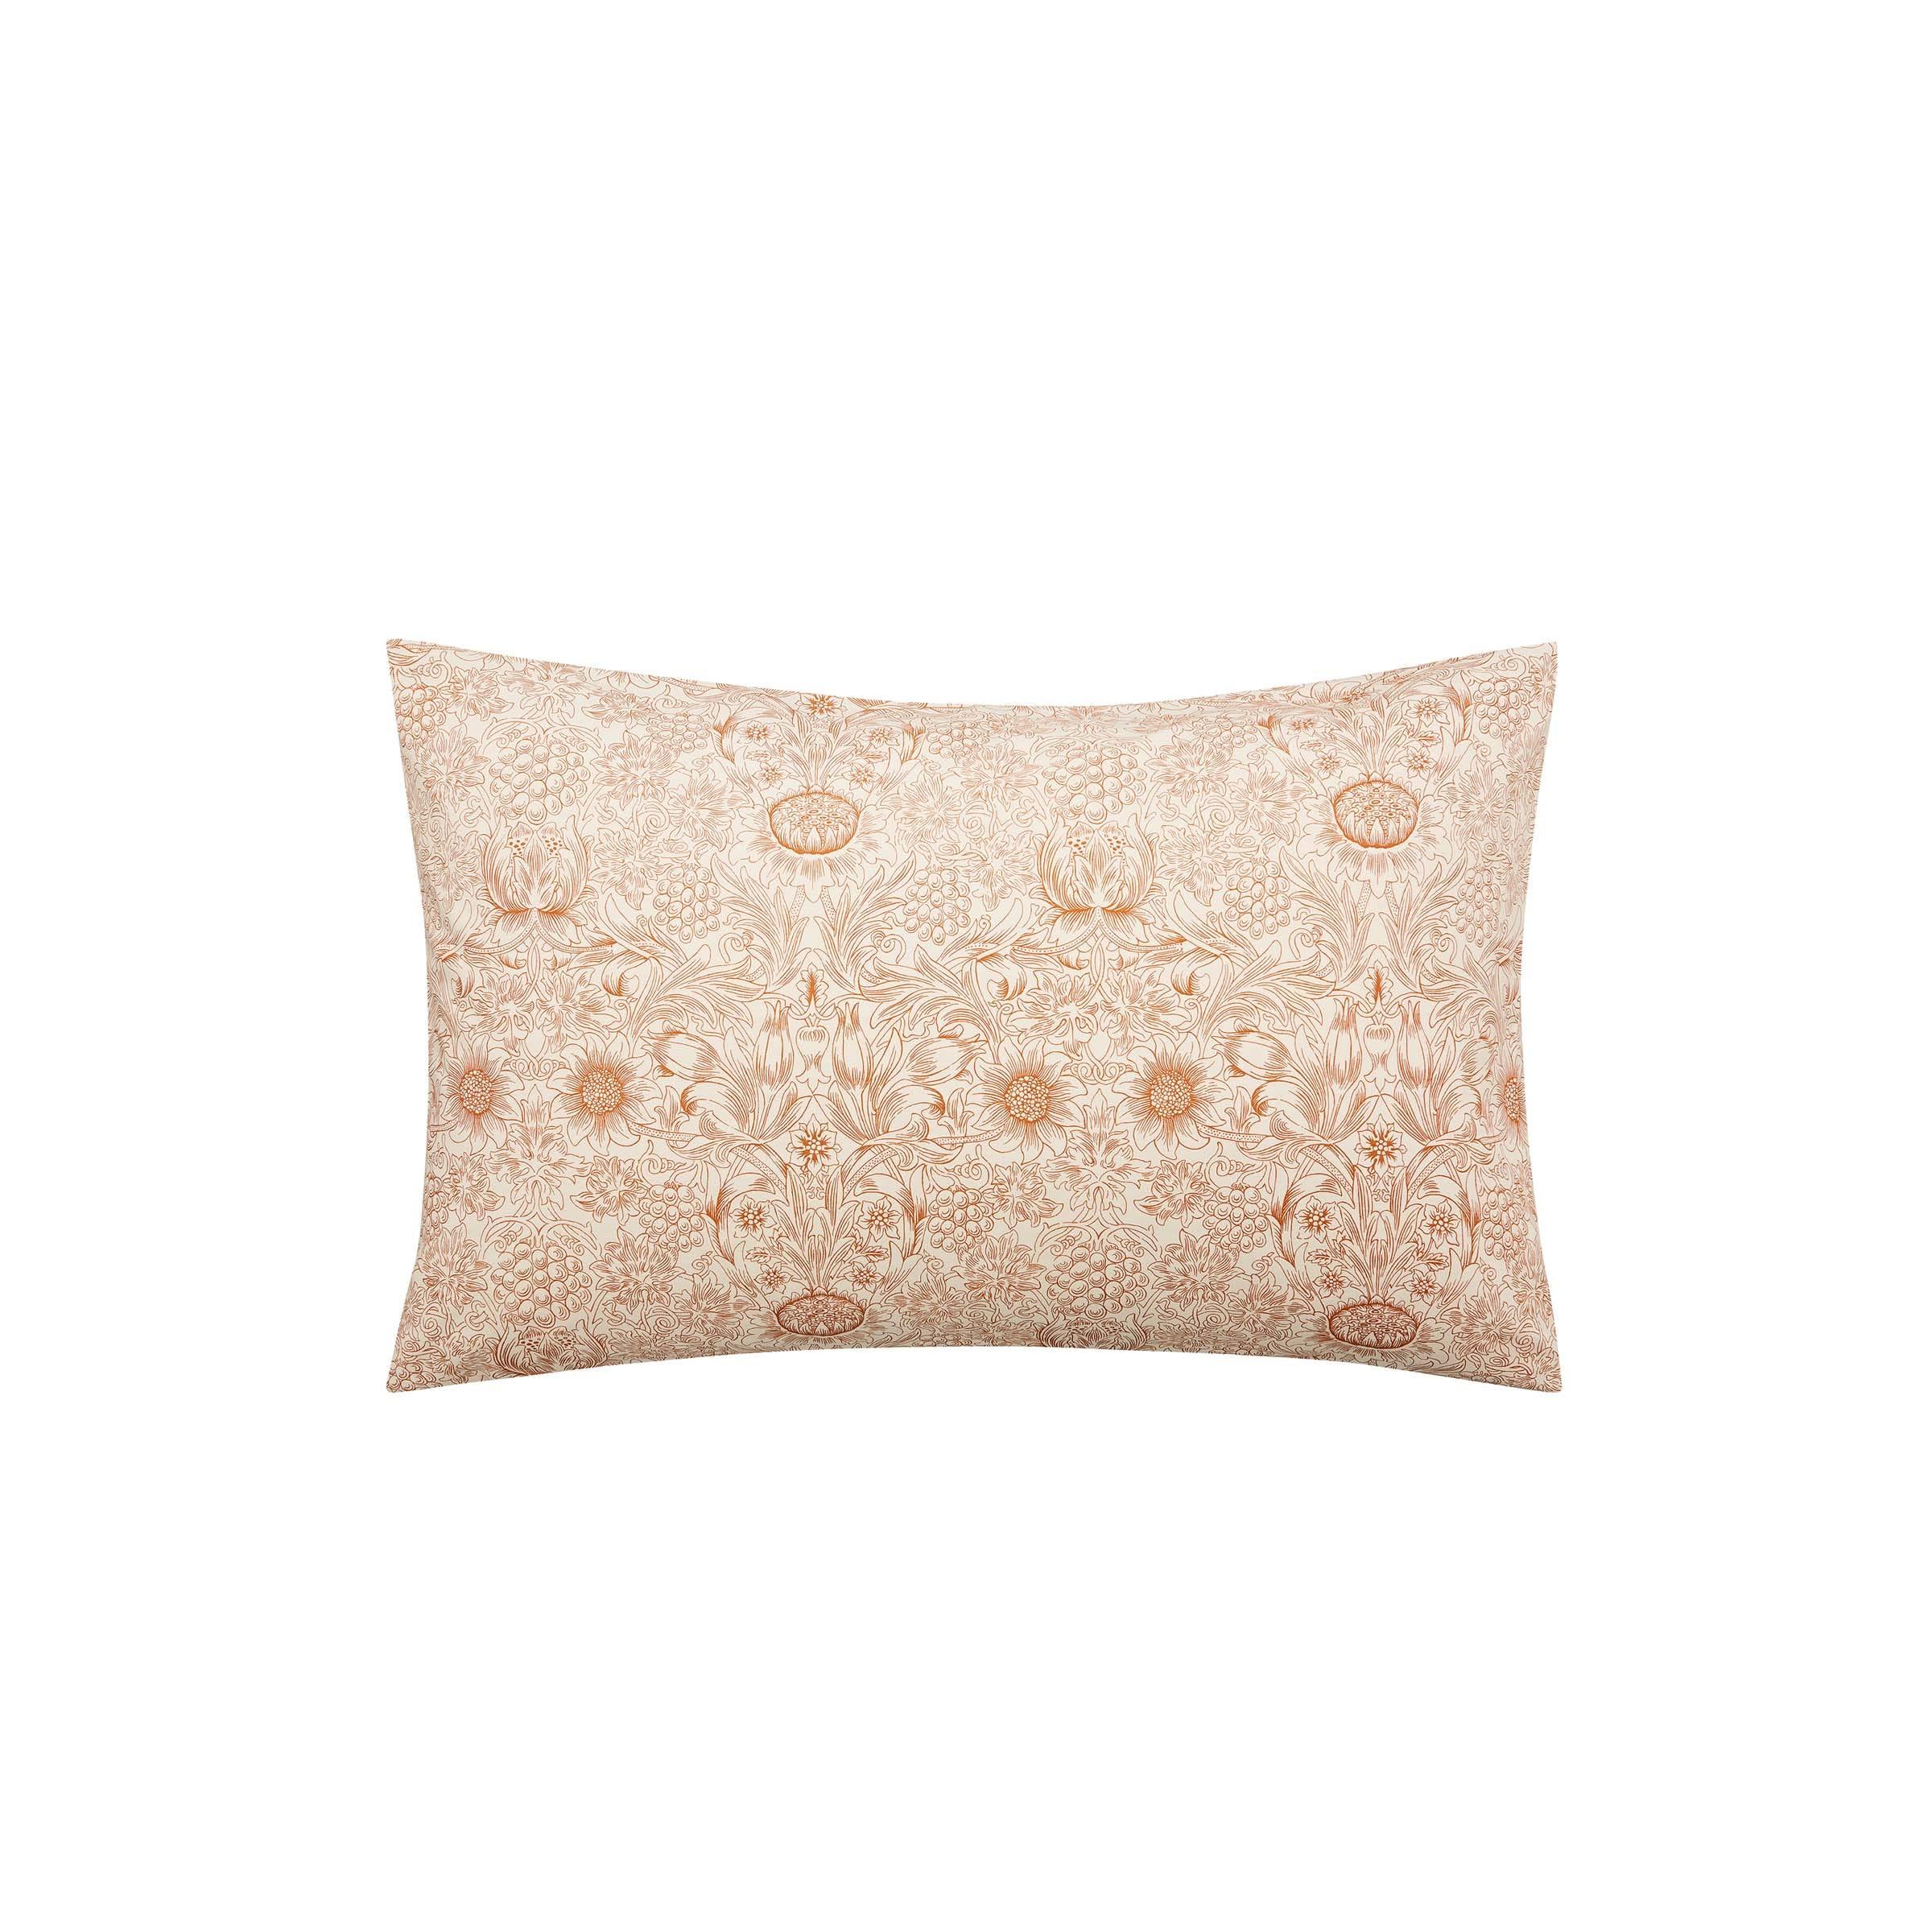 William Morris Sunflower Pair of Housewife Pillowcases, Saffron